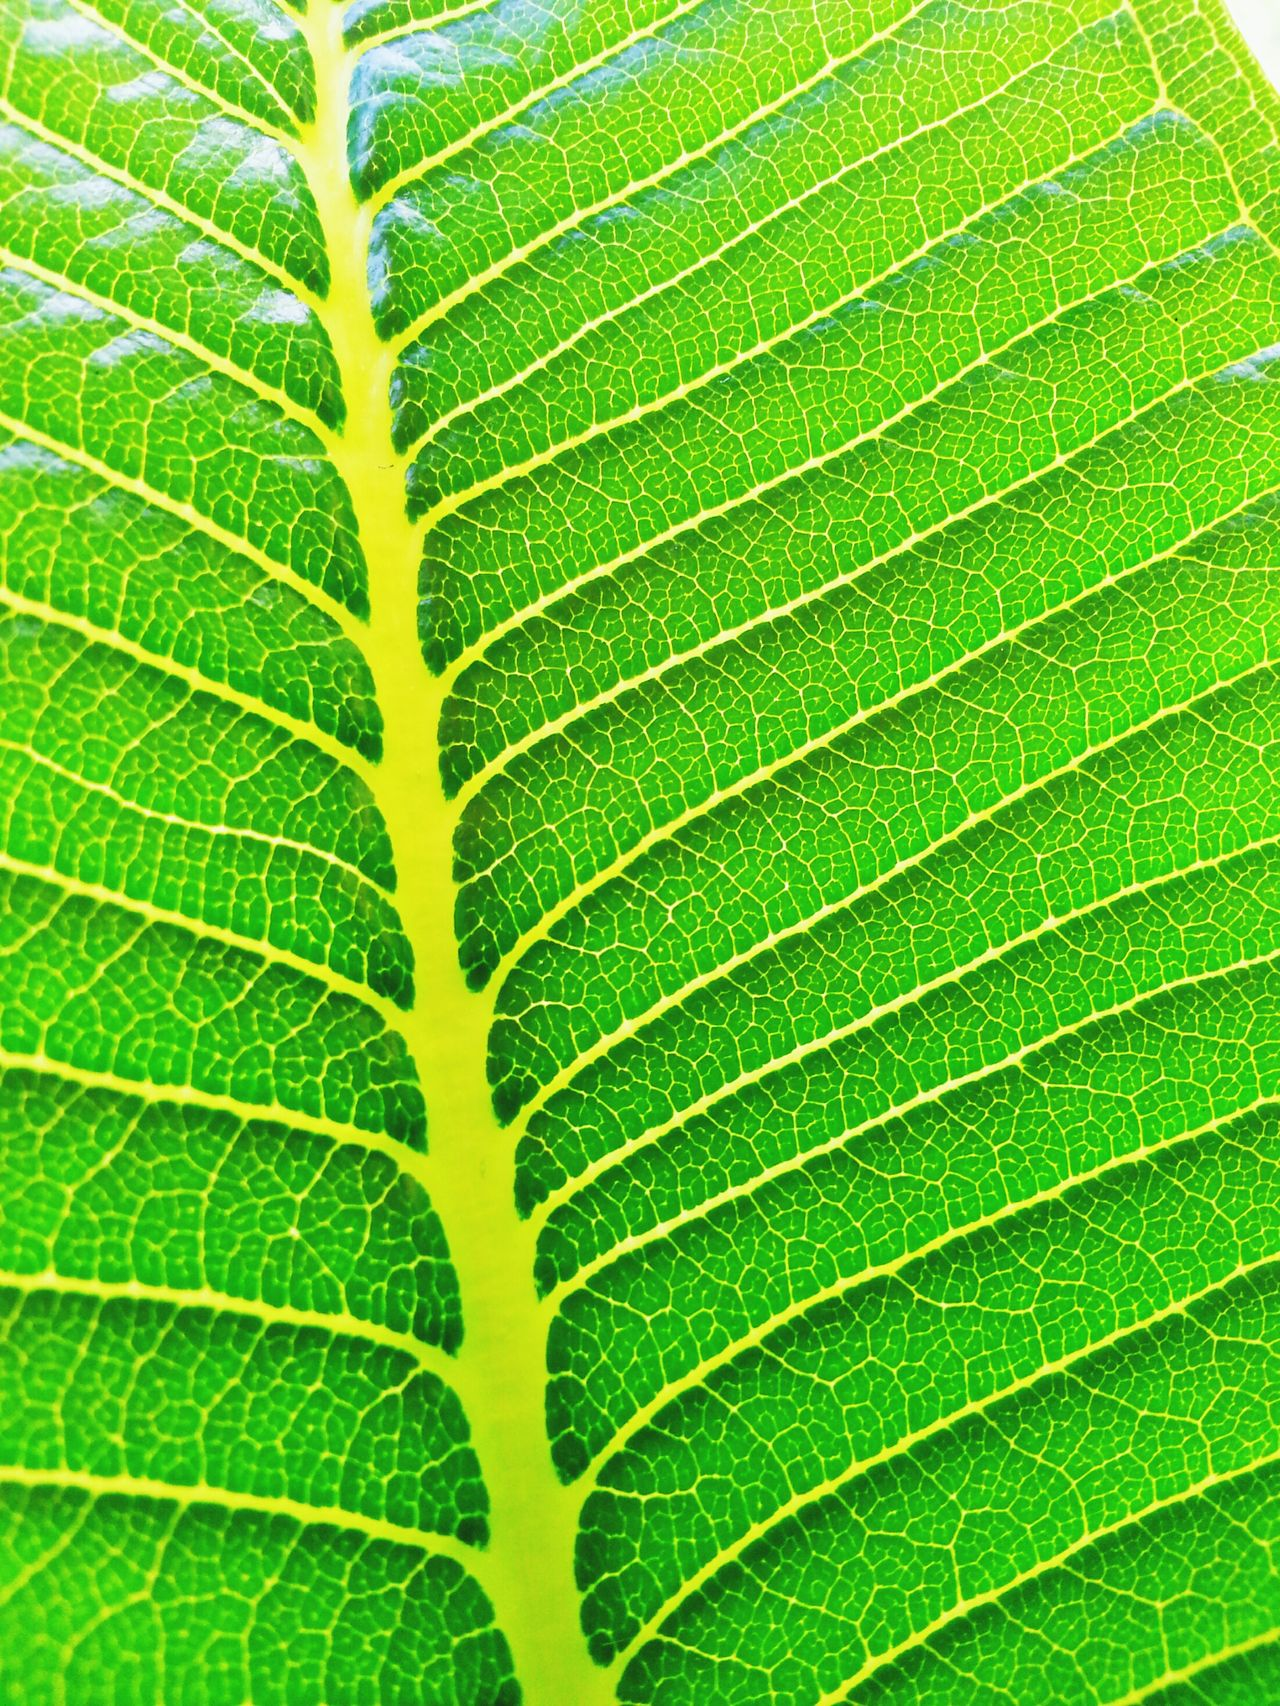 Green Leaf Naturephotography Nature